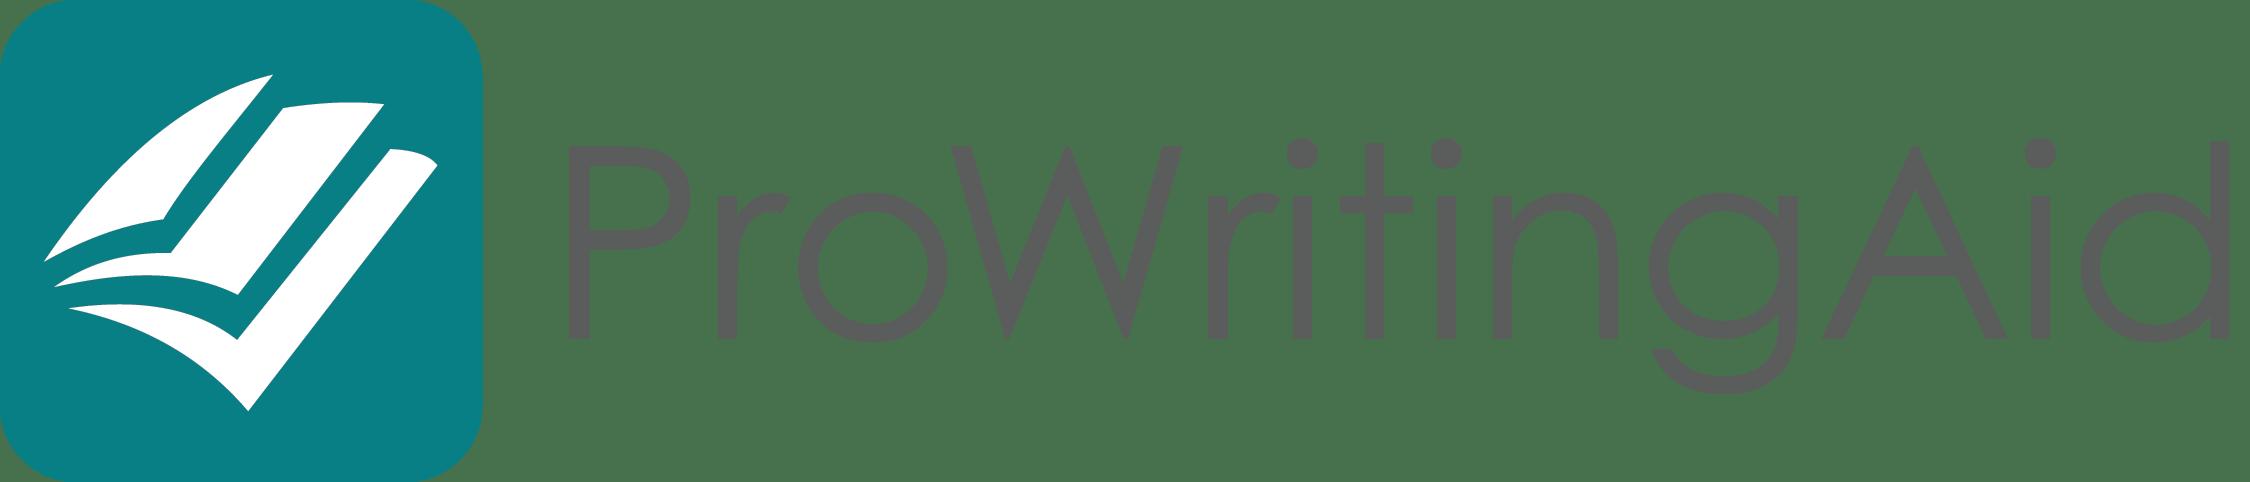 PWA-long-logo-no-background (1)[1013]